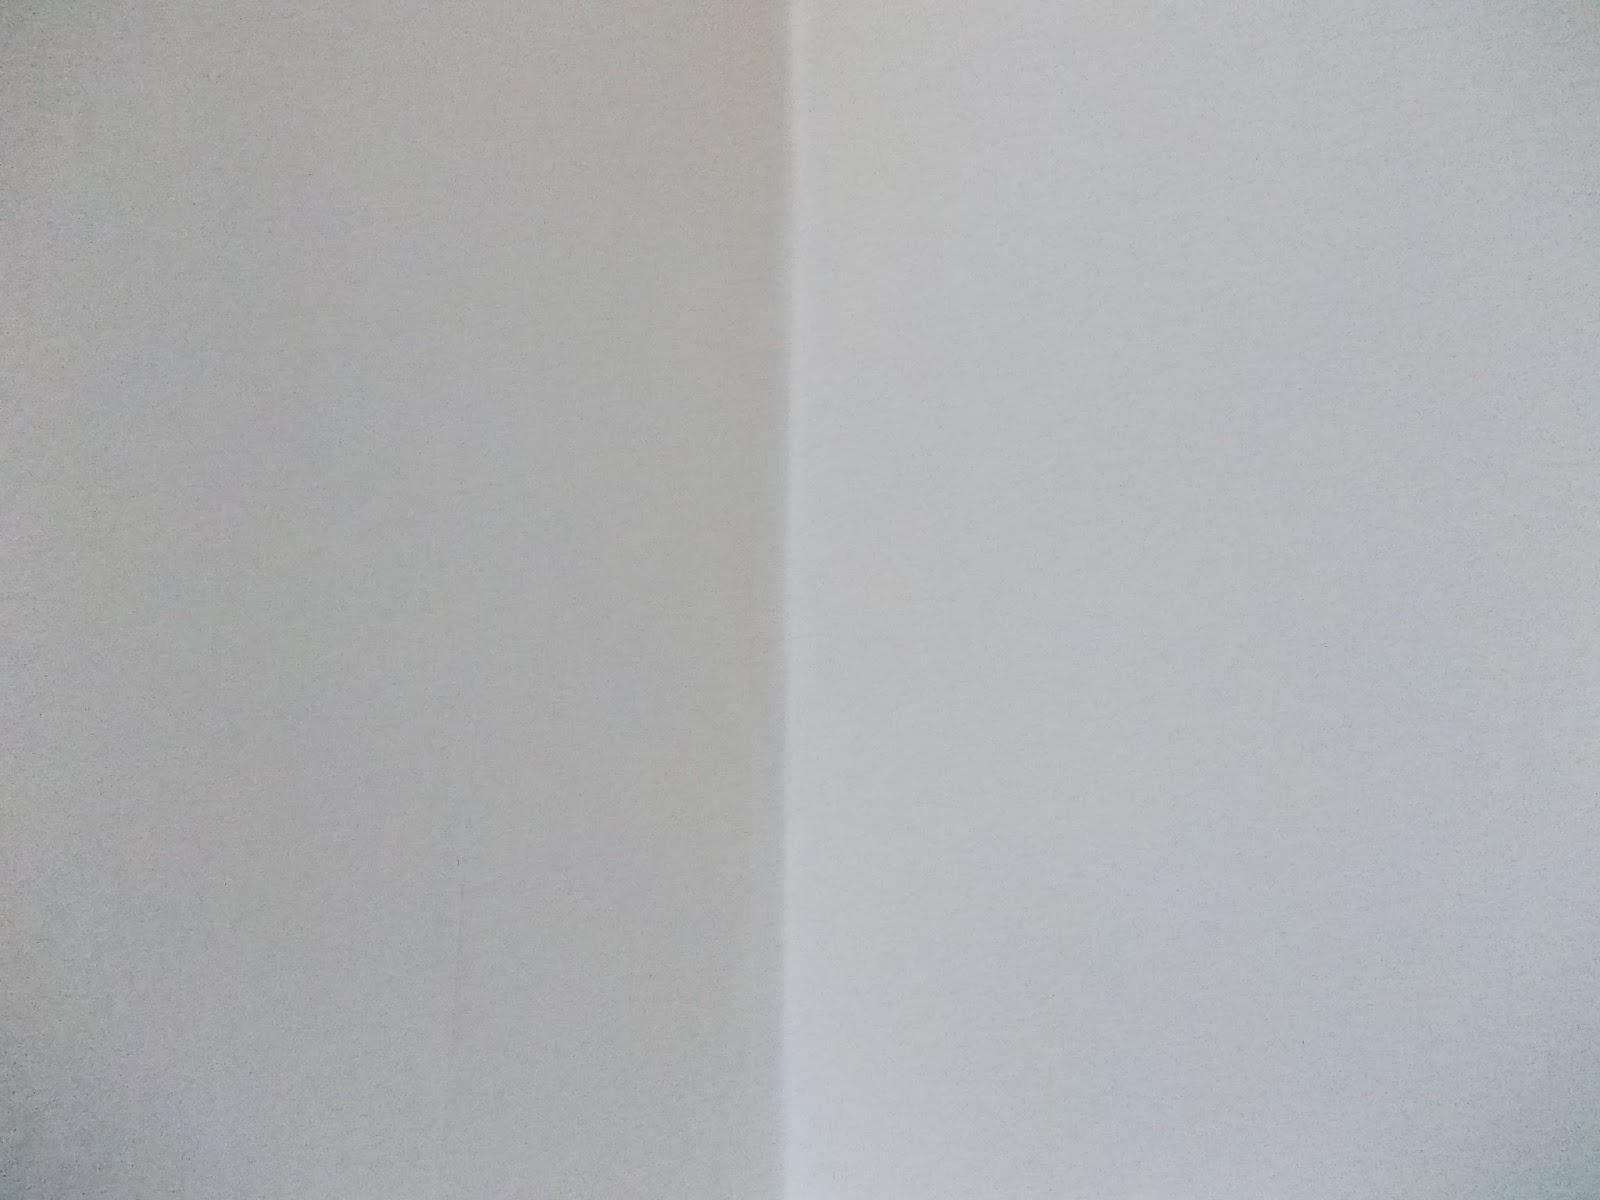 Marcella testet: AURO Plantodecor Premium-Wandfarbe im Test!